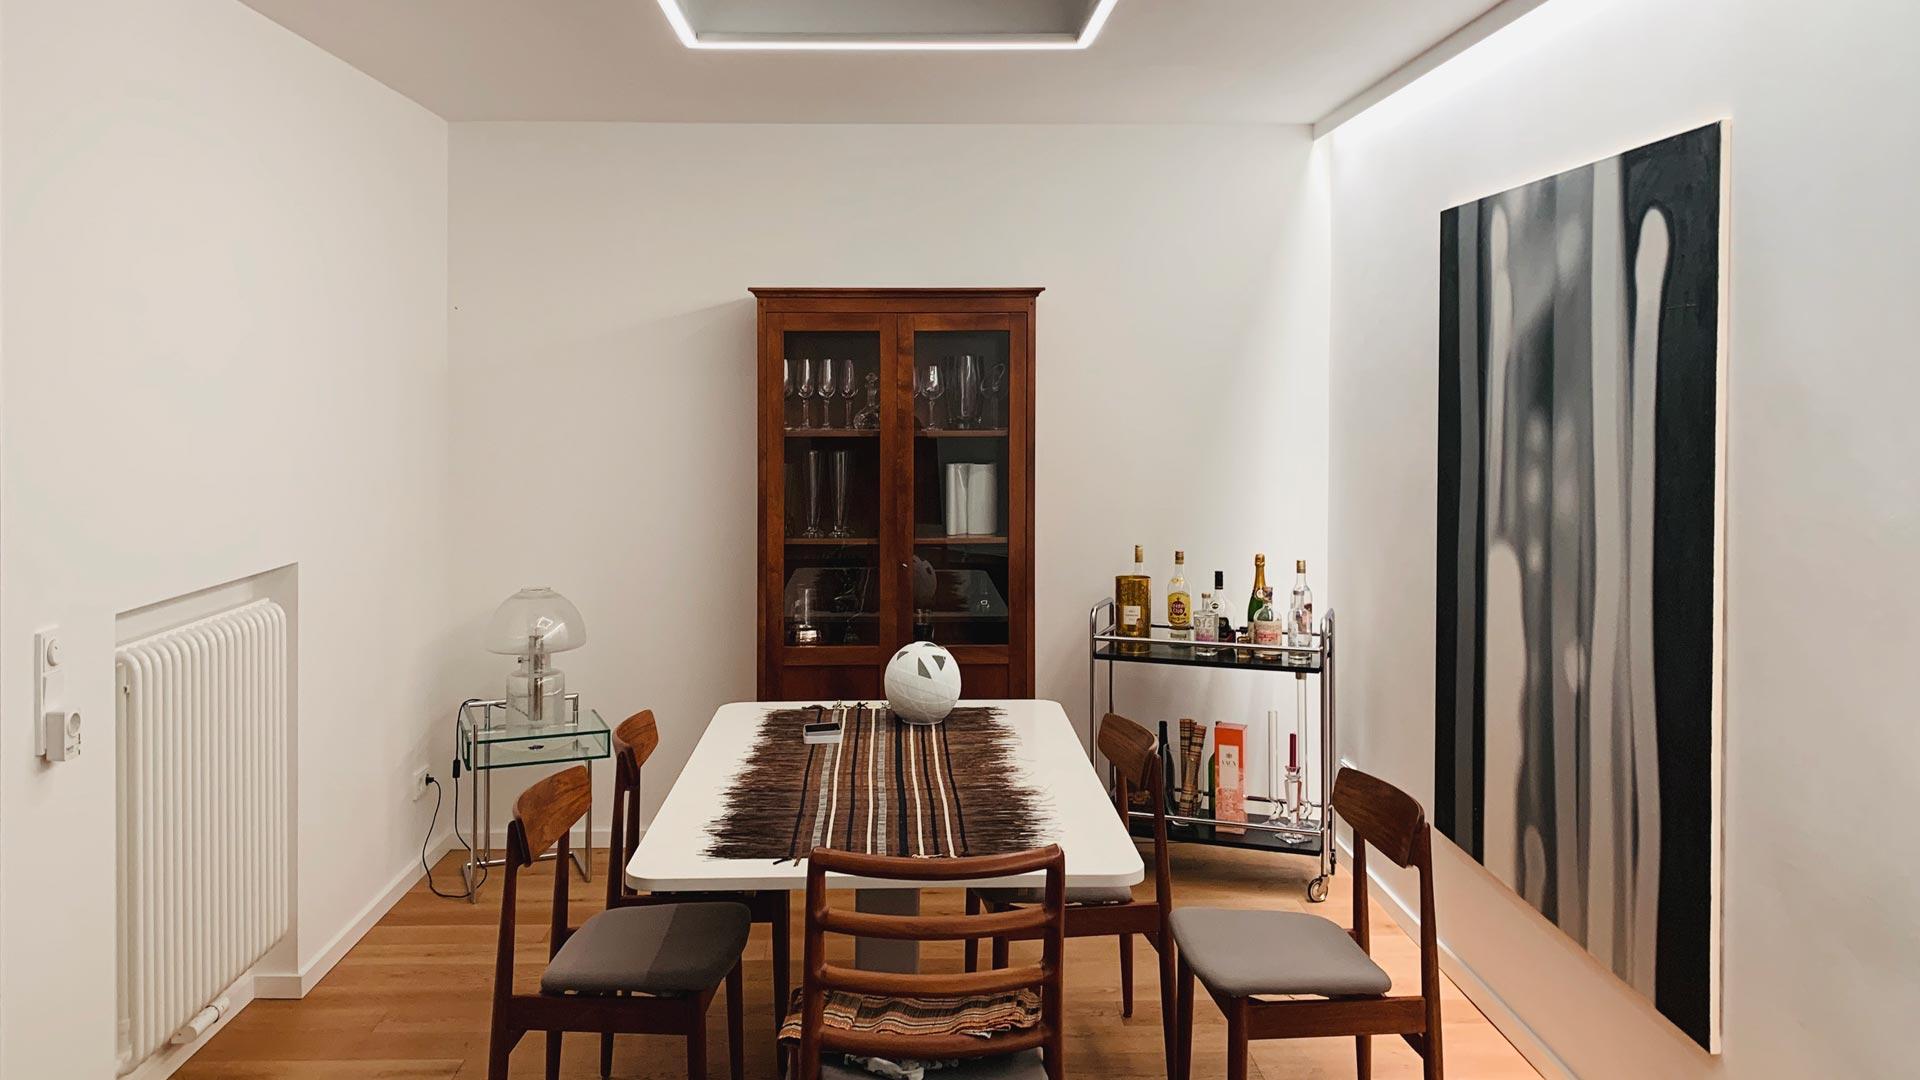 MAASS-Lichtplanung_Beleuchtung eines Einfamilienhaus__191007-MAASS-Licht_EFH_Wohnzimmer